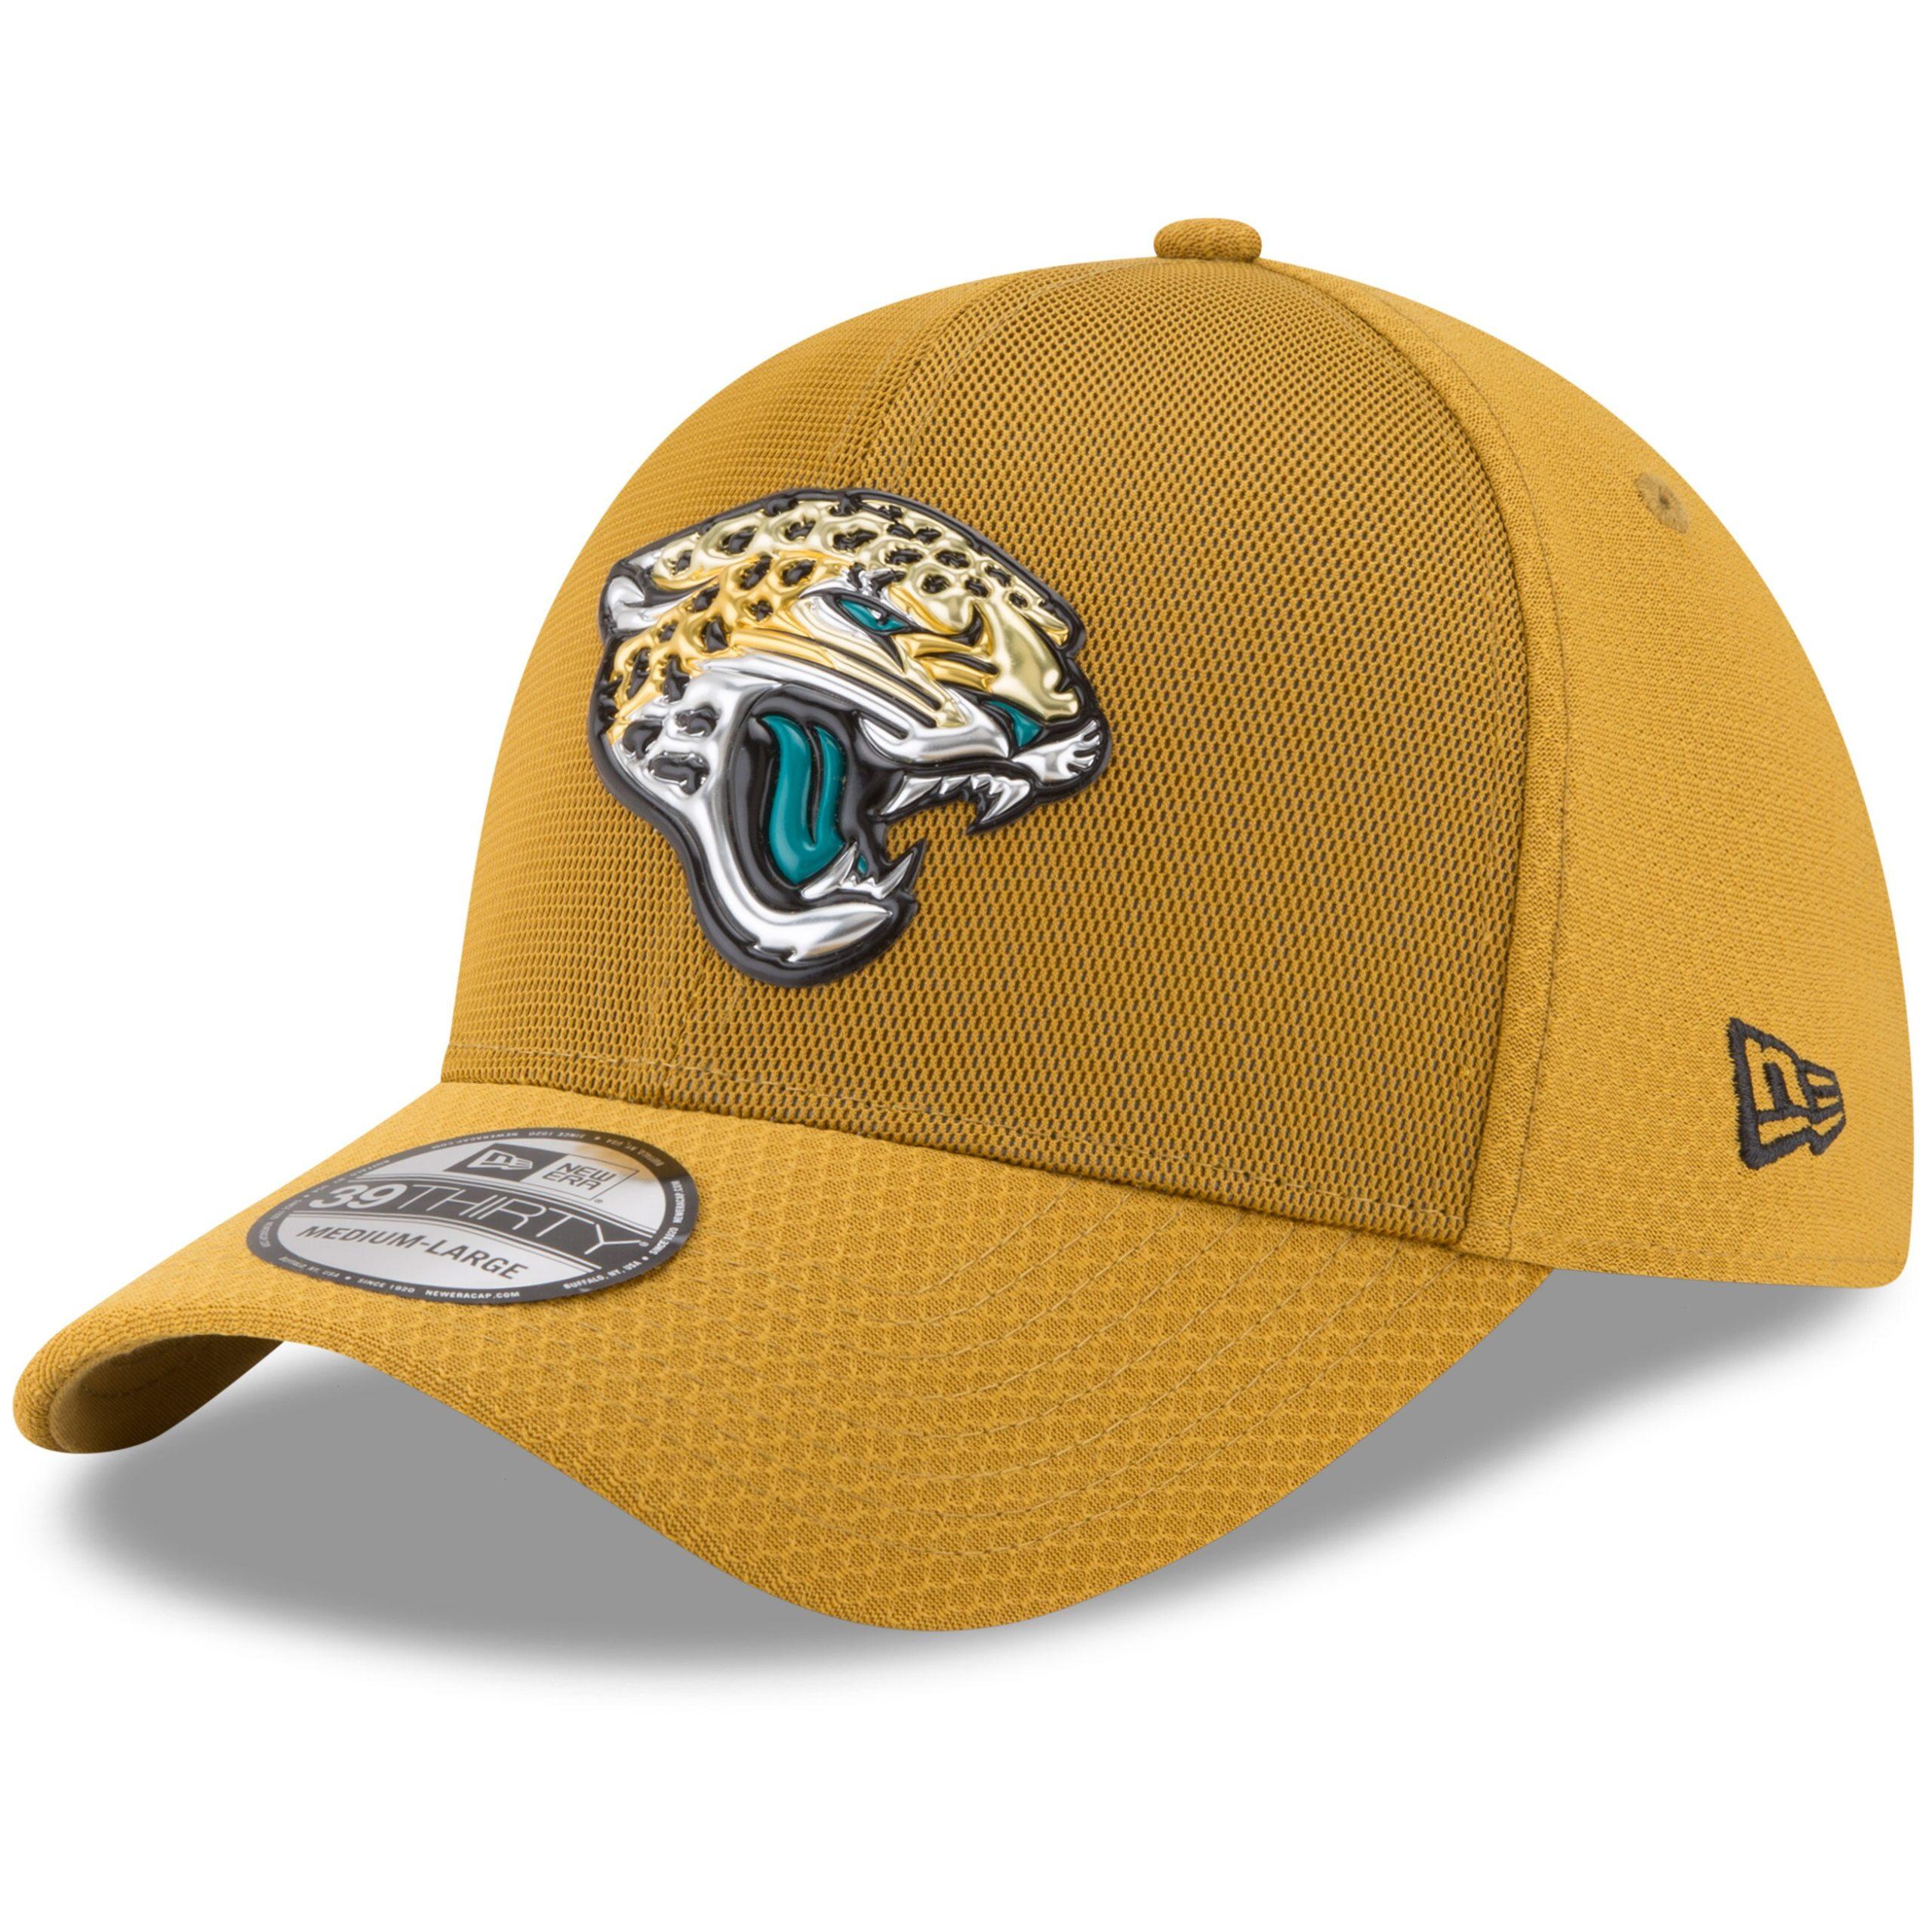 Jacksonville Jaguars New Era 2017 Color Rush 39THIRTY Flex Hat - Gold